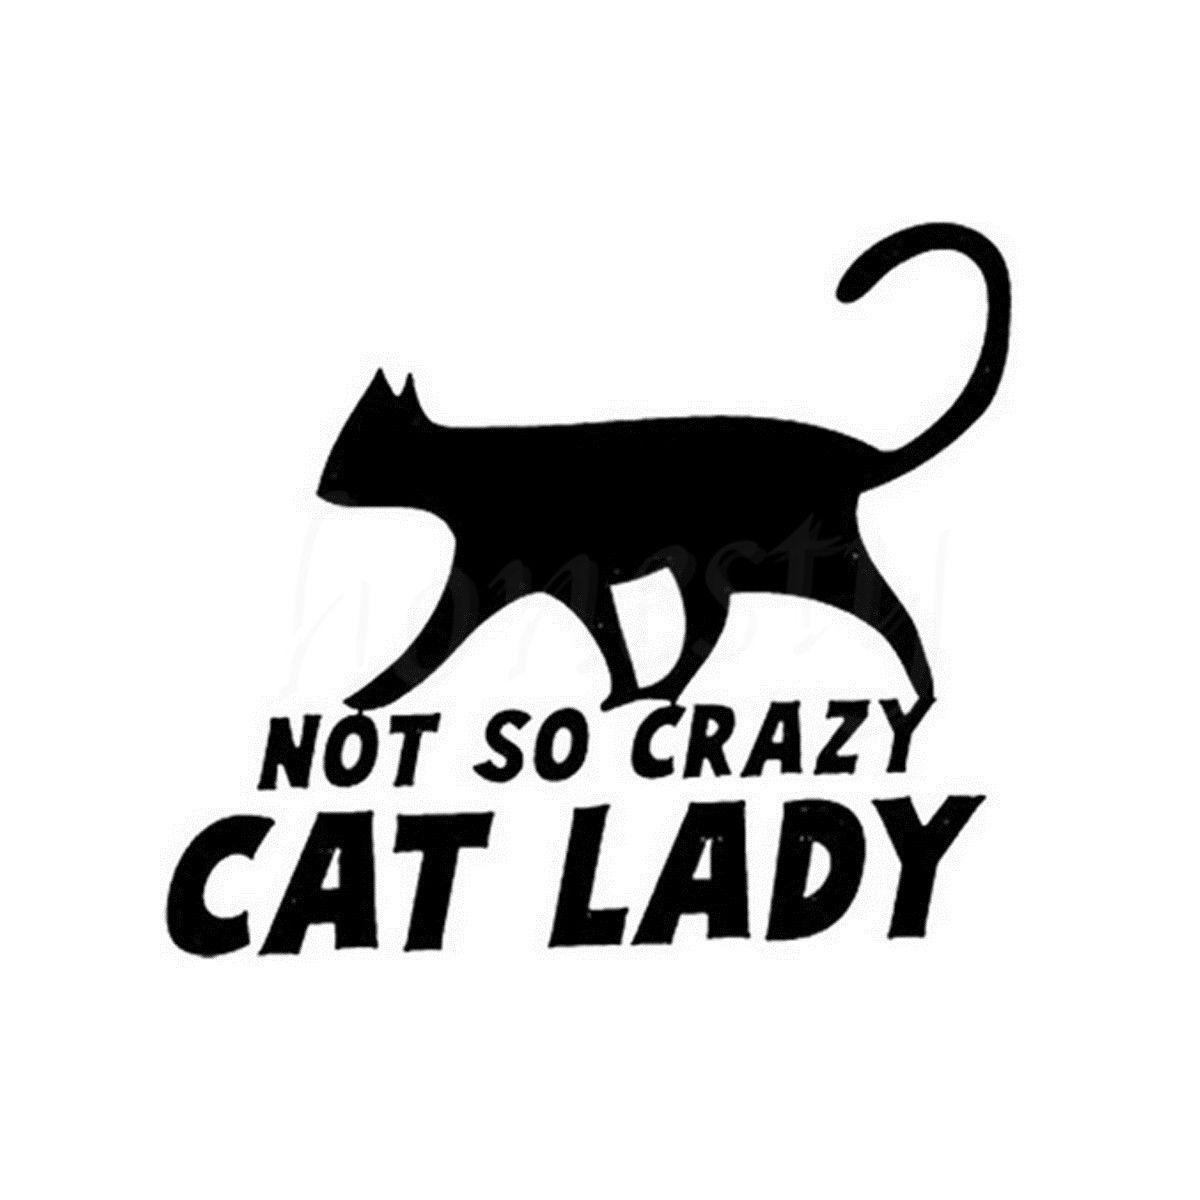 Fashion NOT SO CRAZY CAT LADY Animal Cartoon Car Sticker Wall Home Glass Window Door Black Decal Vinyl Sticker 13.2cmX11.5cm